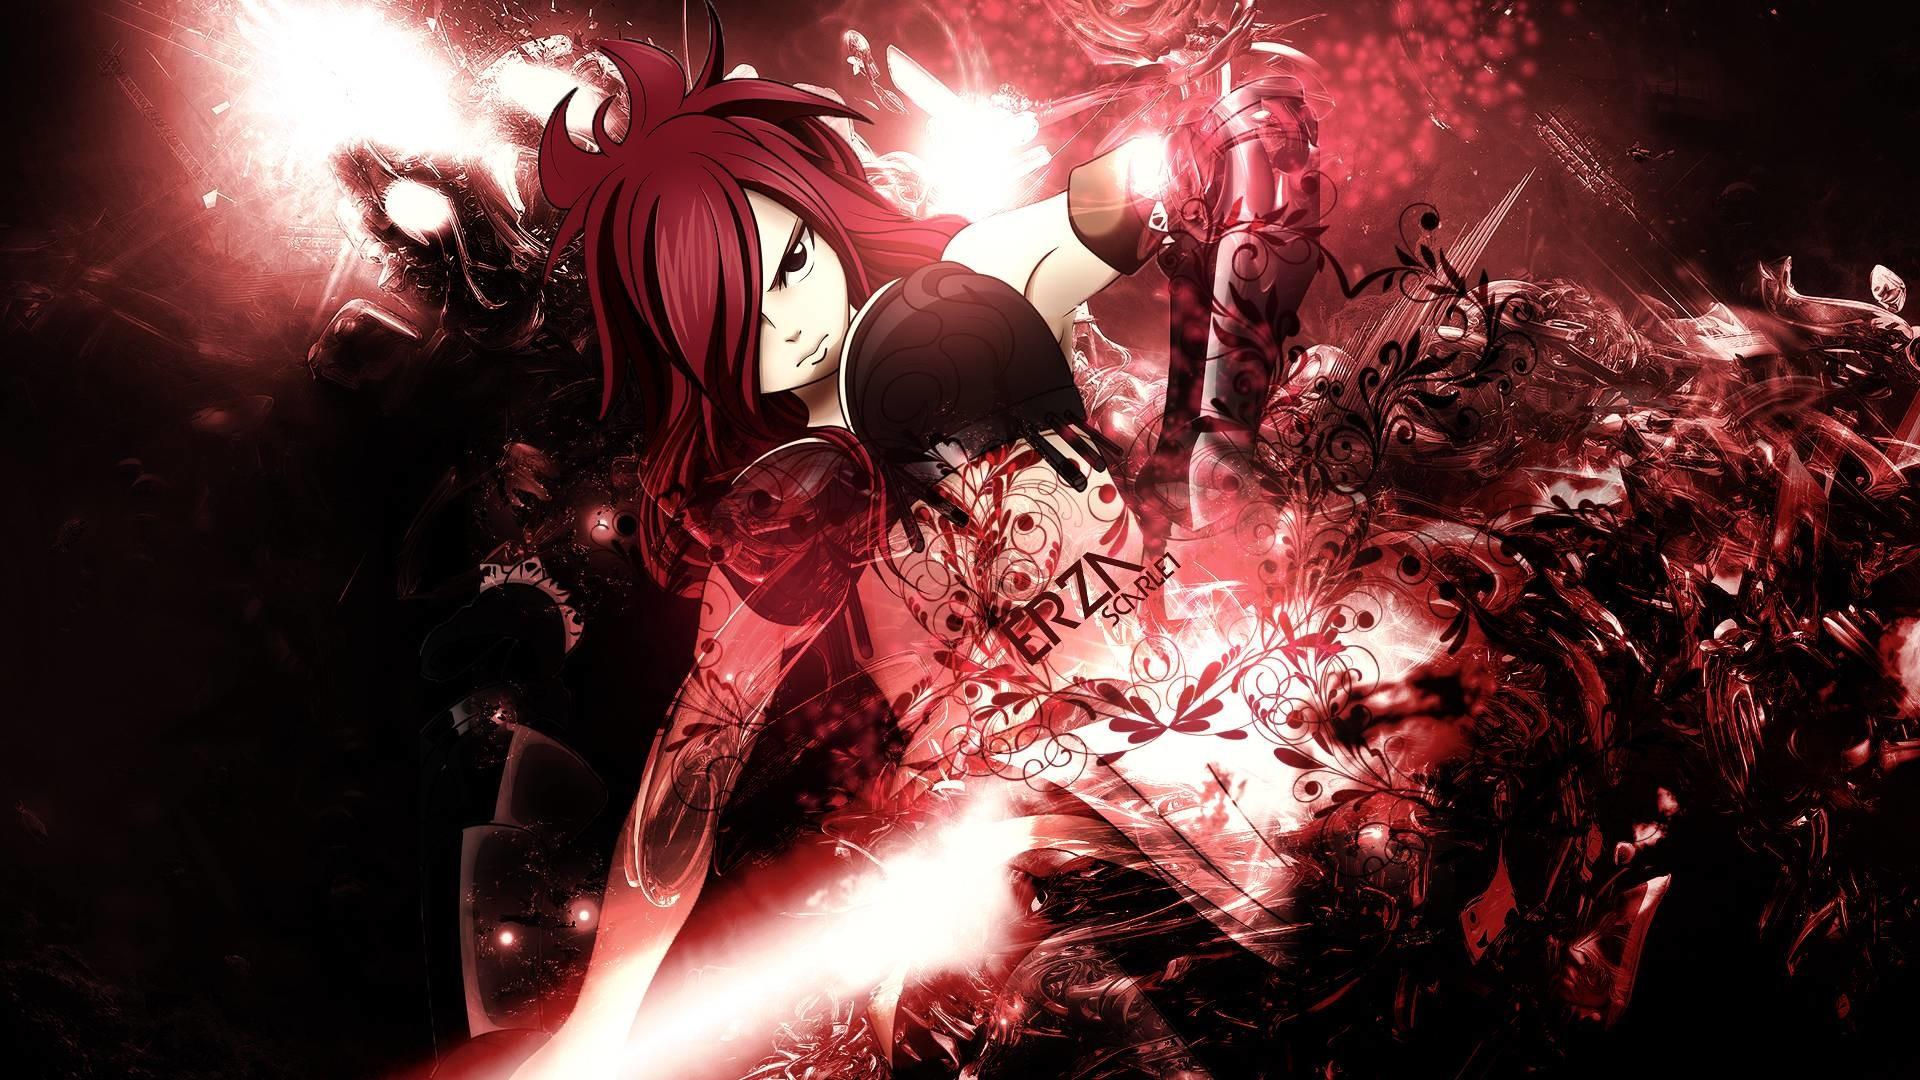 Cute Anime Wallpaper Hd Free Download Fairy Tail Wallpaper Hd 183 ①